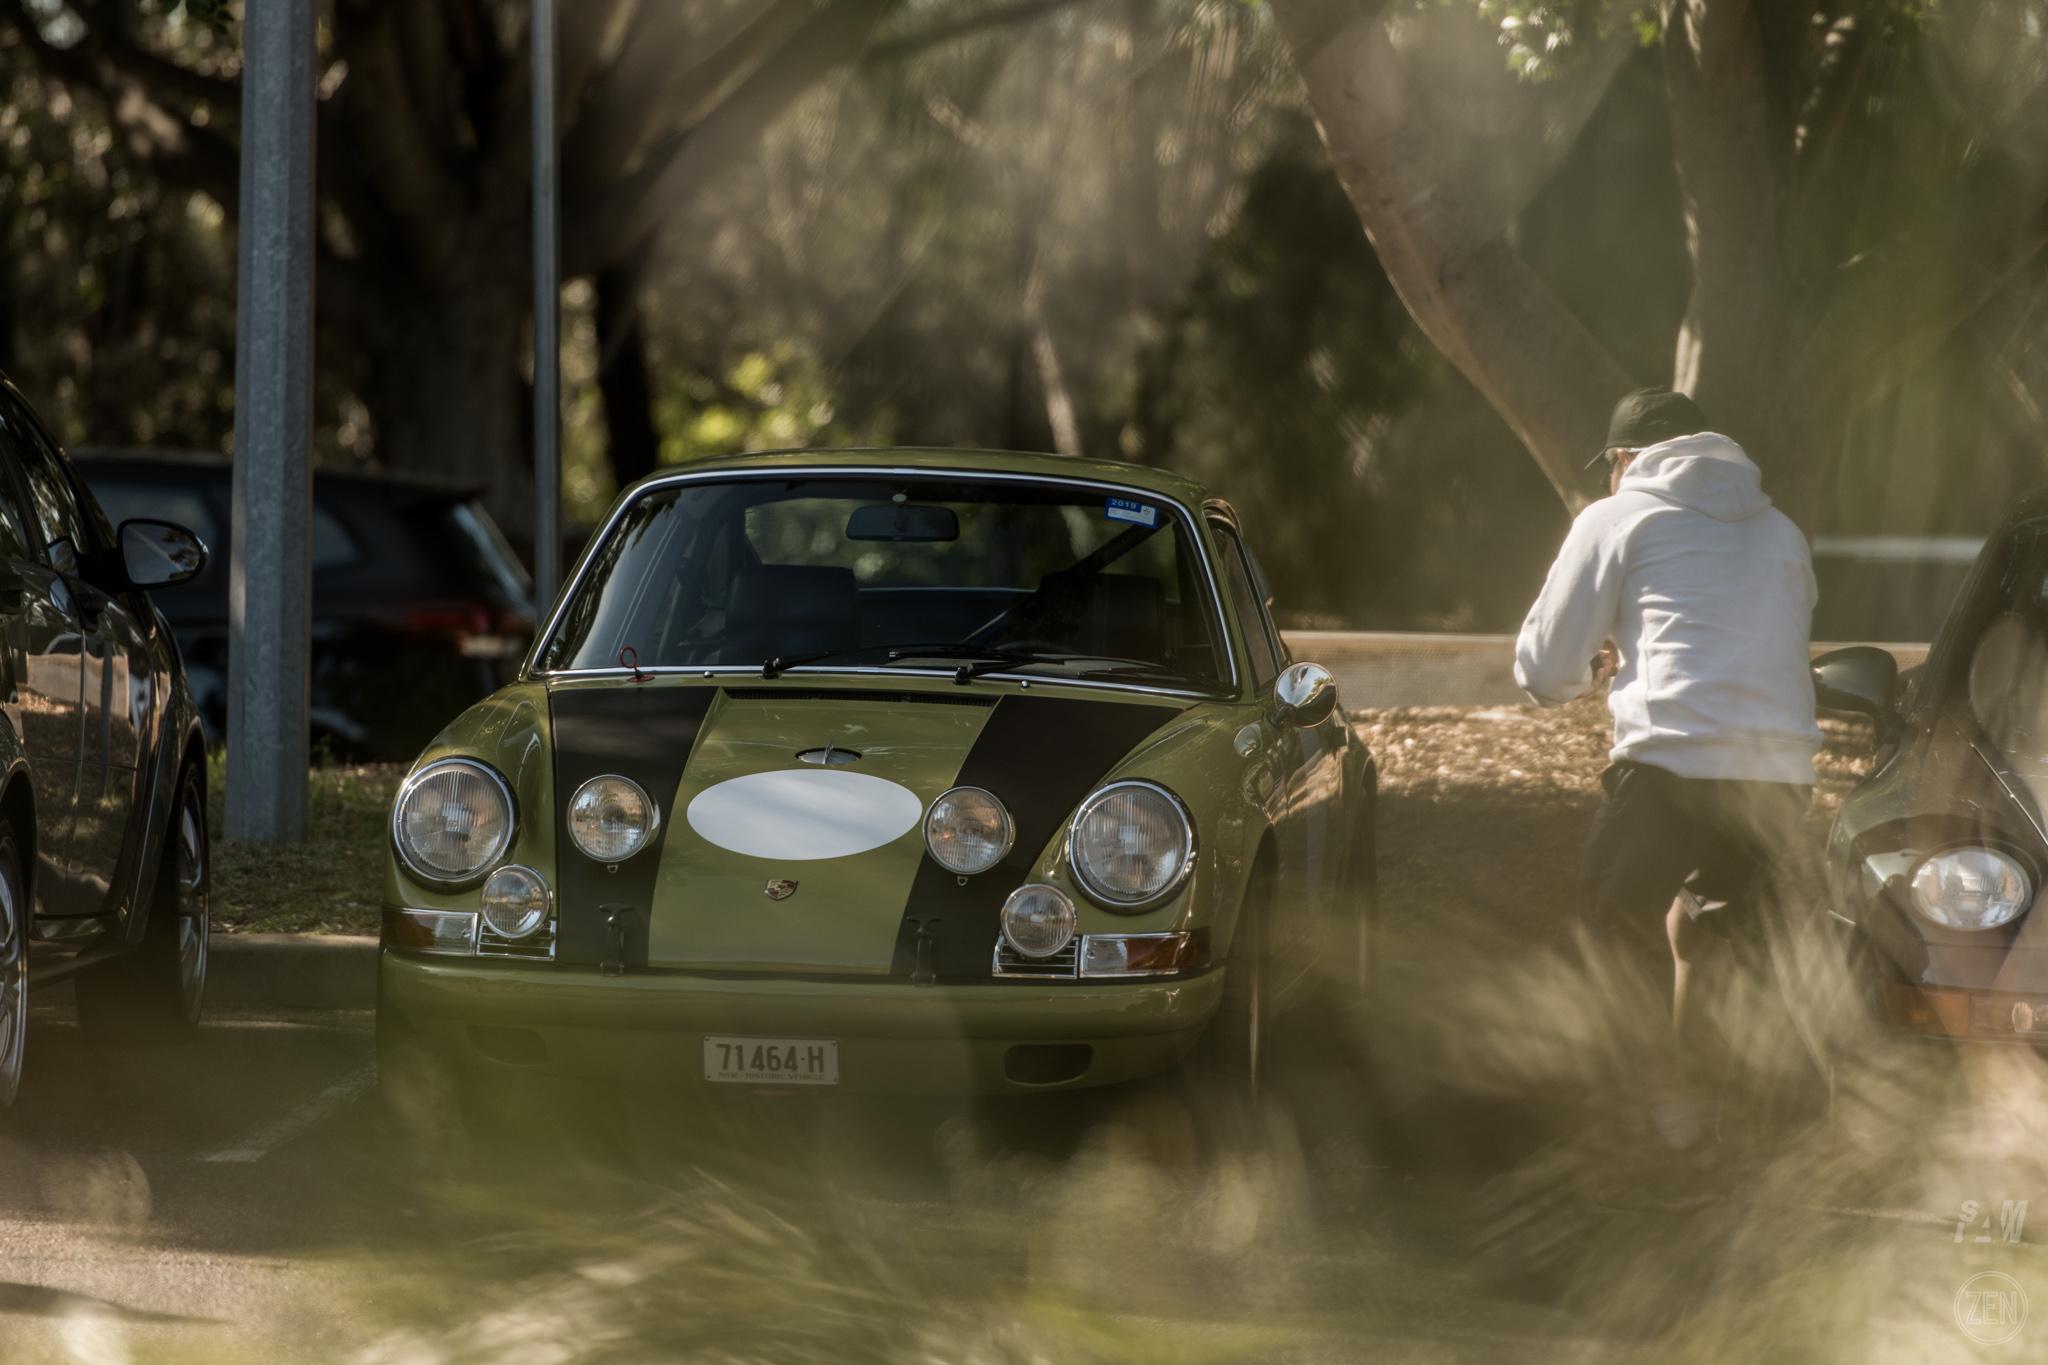 2019-10-27 - Autohaus Porsches & Coffee 152